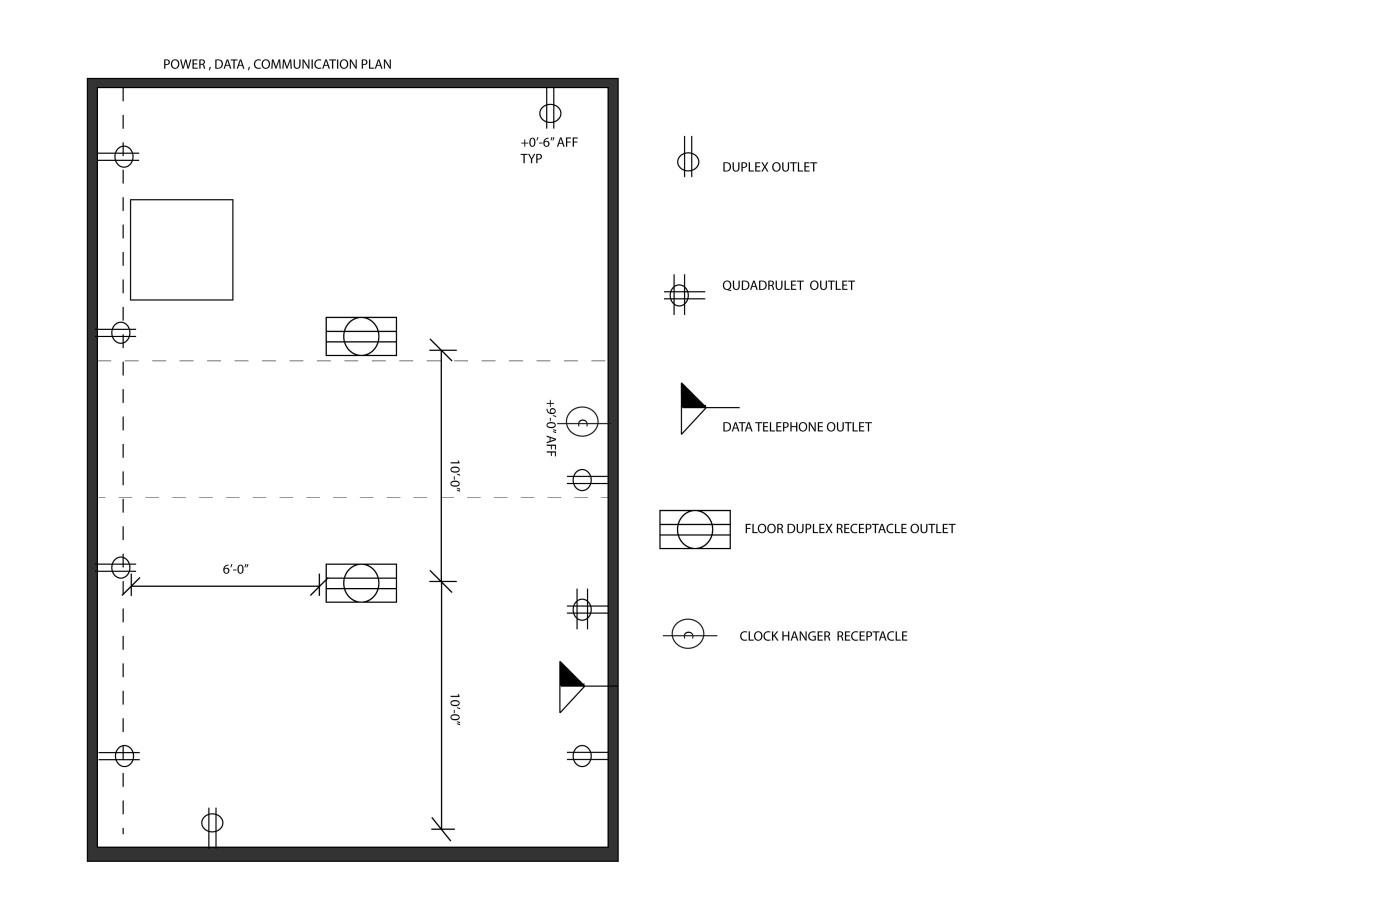 Sketch series 5 Power, Data, Communication Plan | faithoramsey